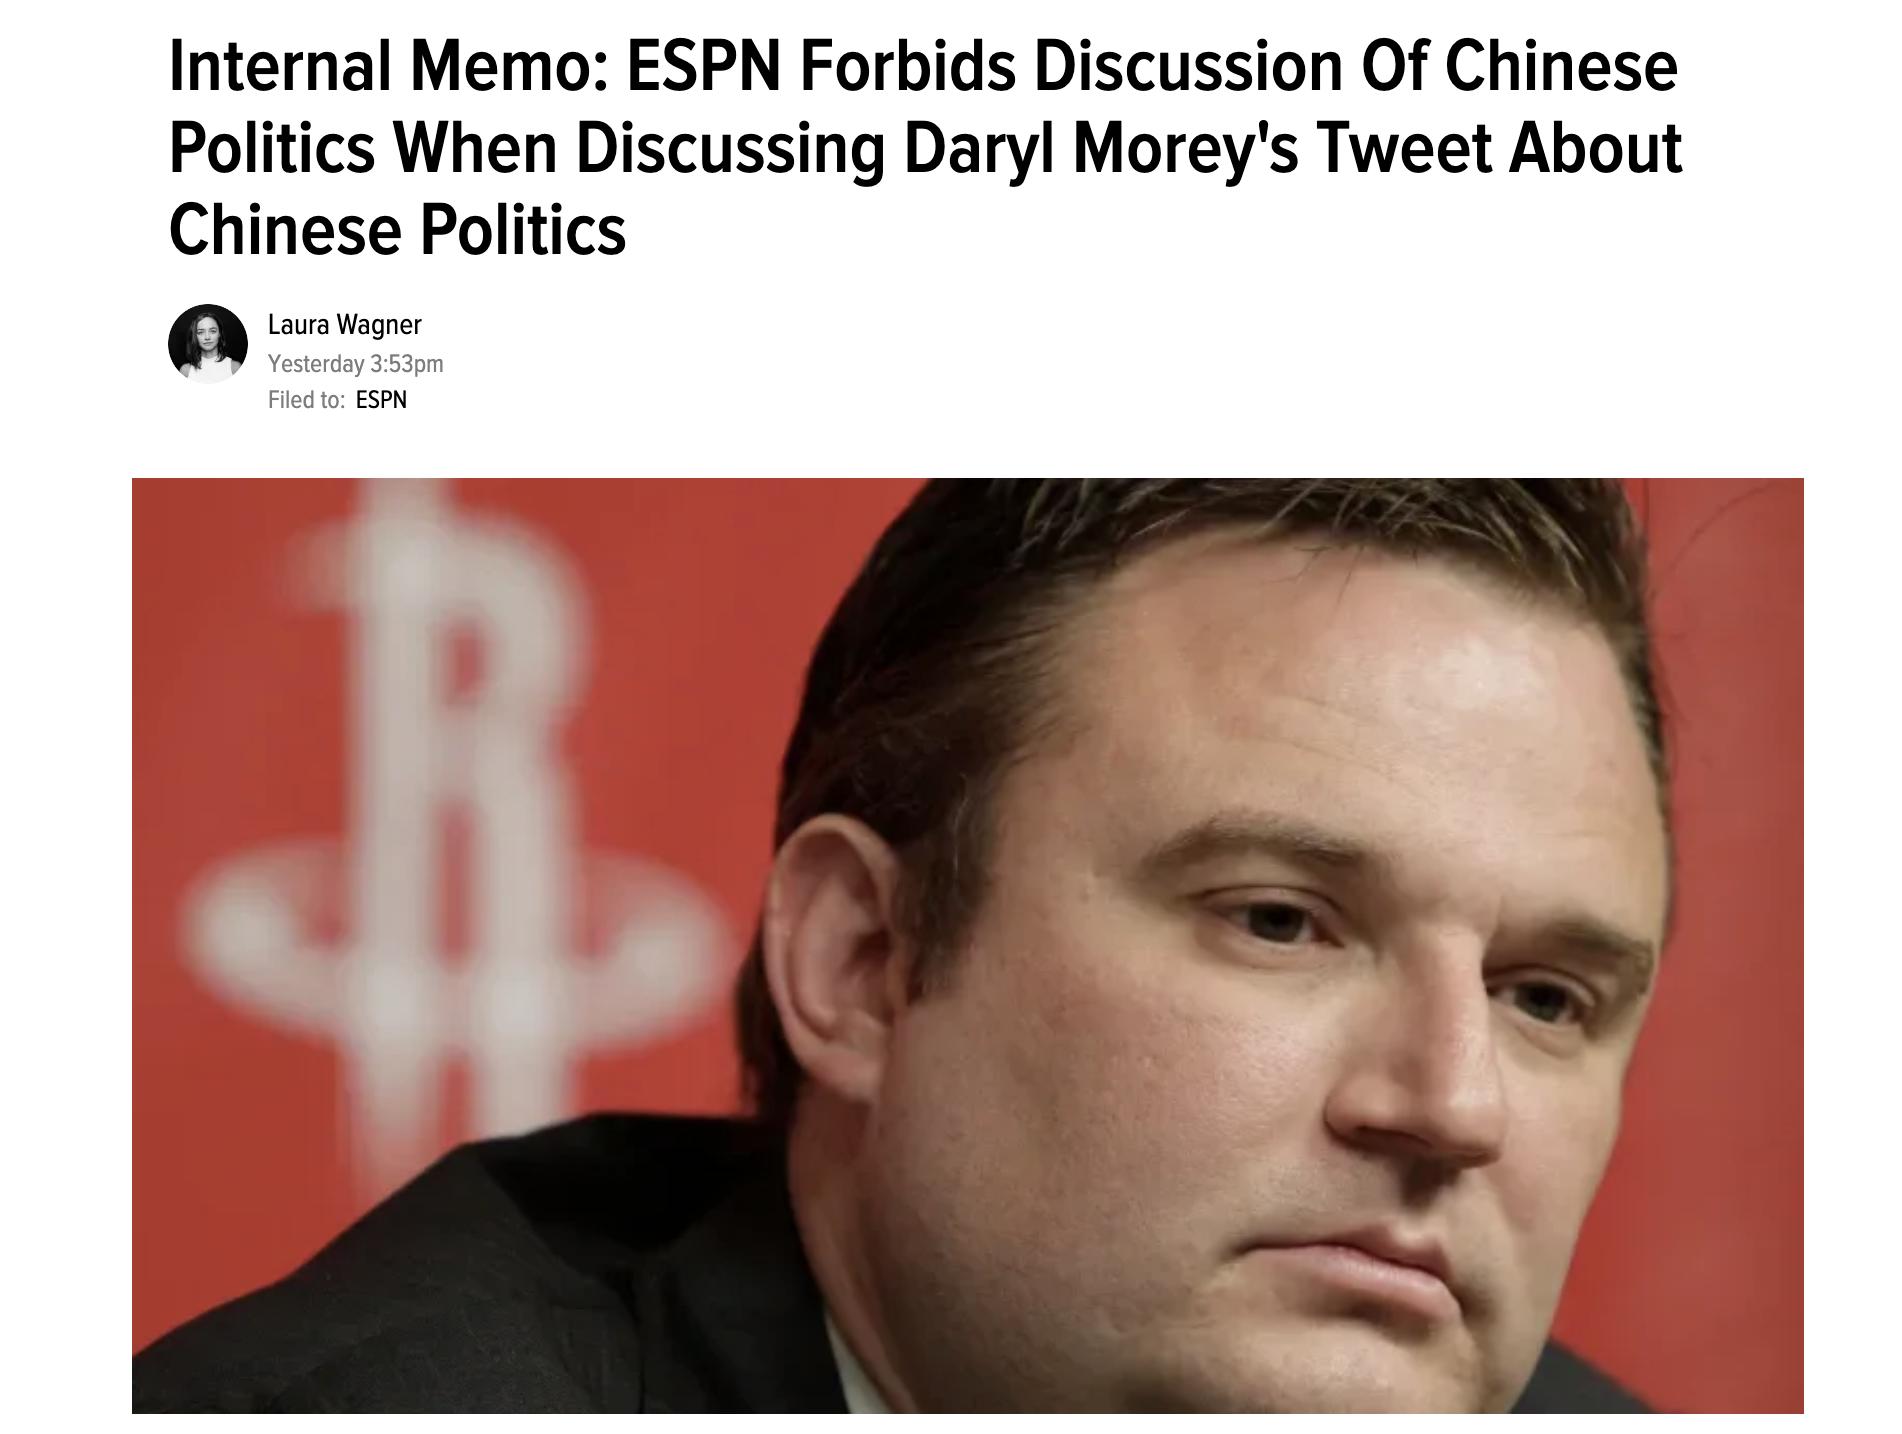 ESPN今日请求旗下的节现在报道中避免商议中国政治